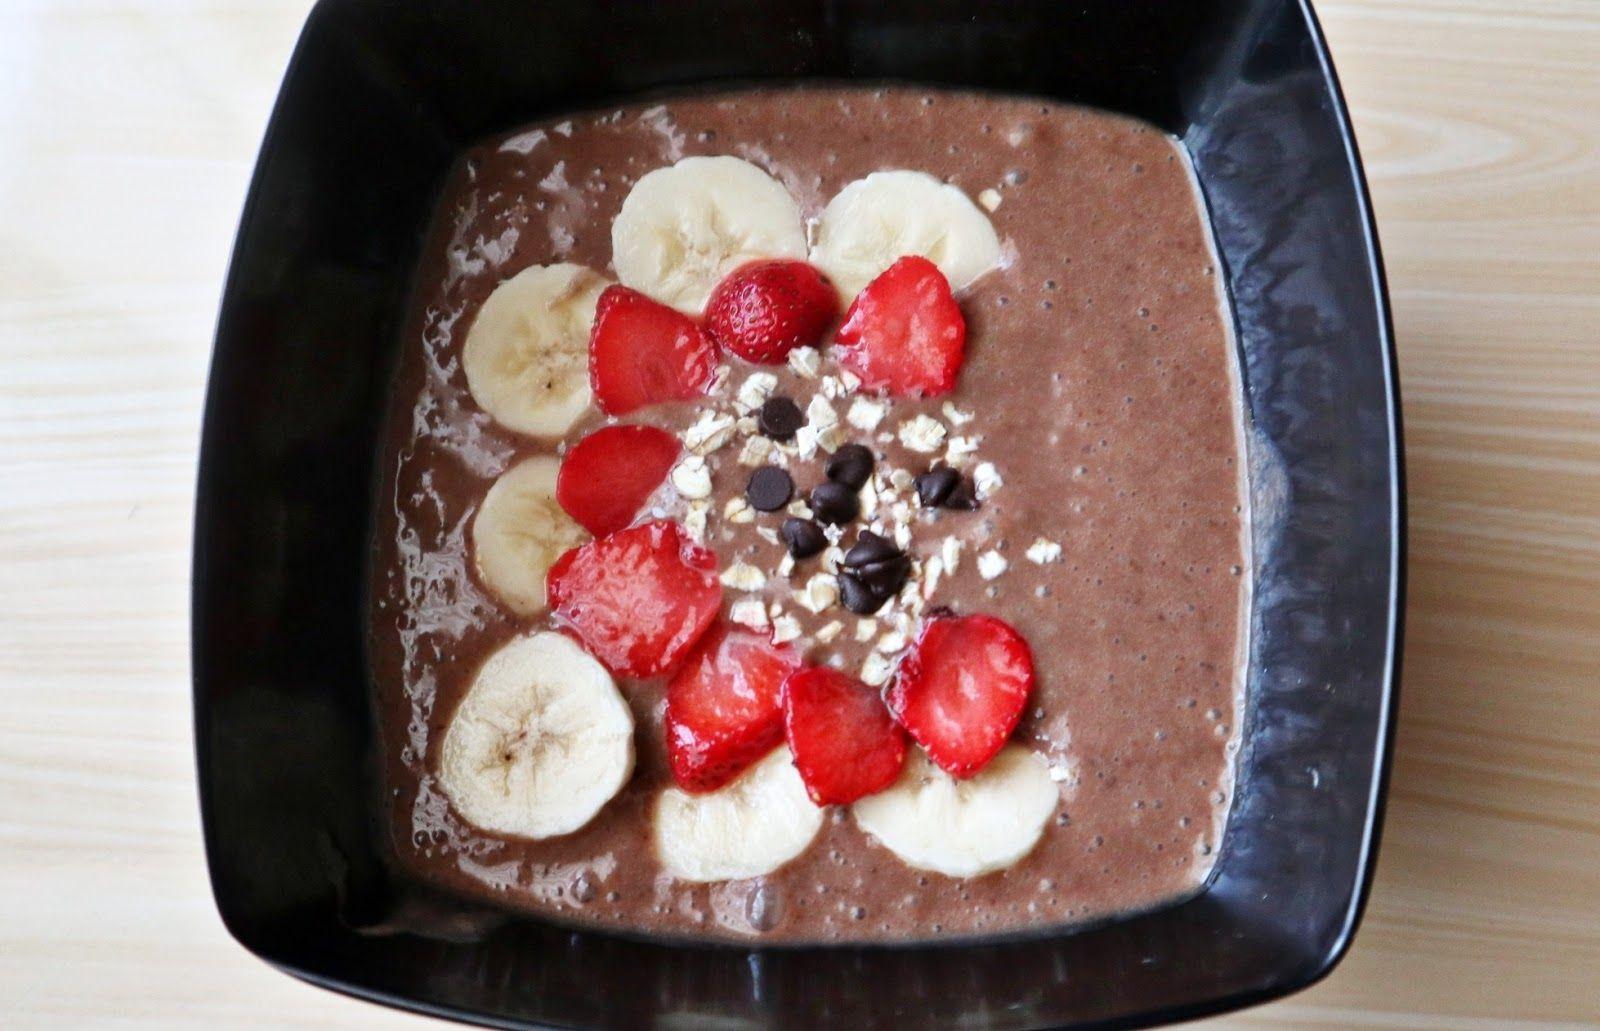 Simply N Delicious Choco Banana Smoothie Bowl Resep Smoothie Selai Coklat Pisang